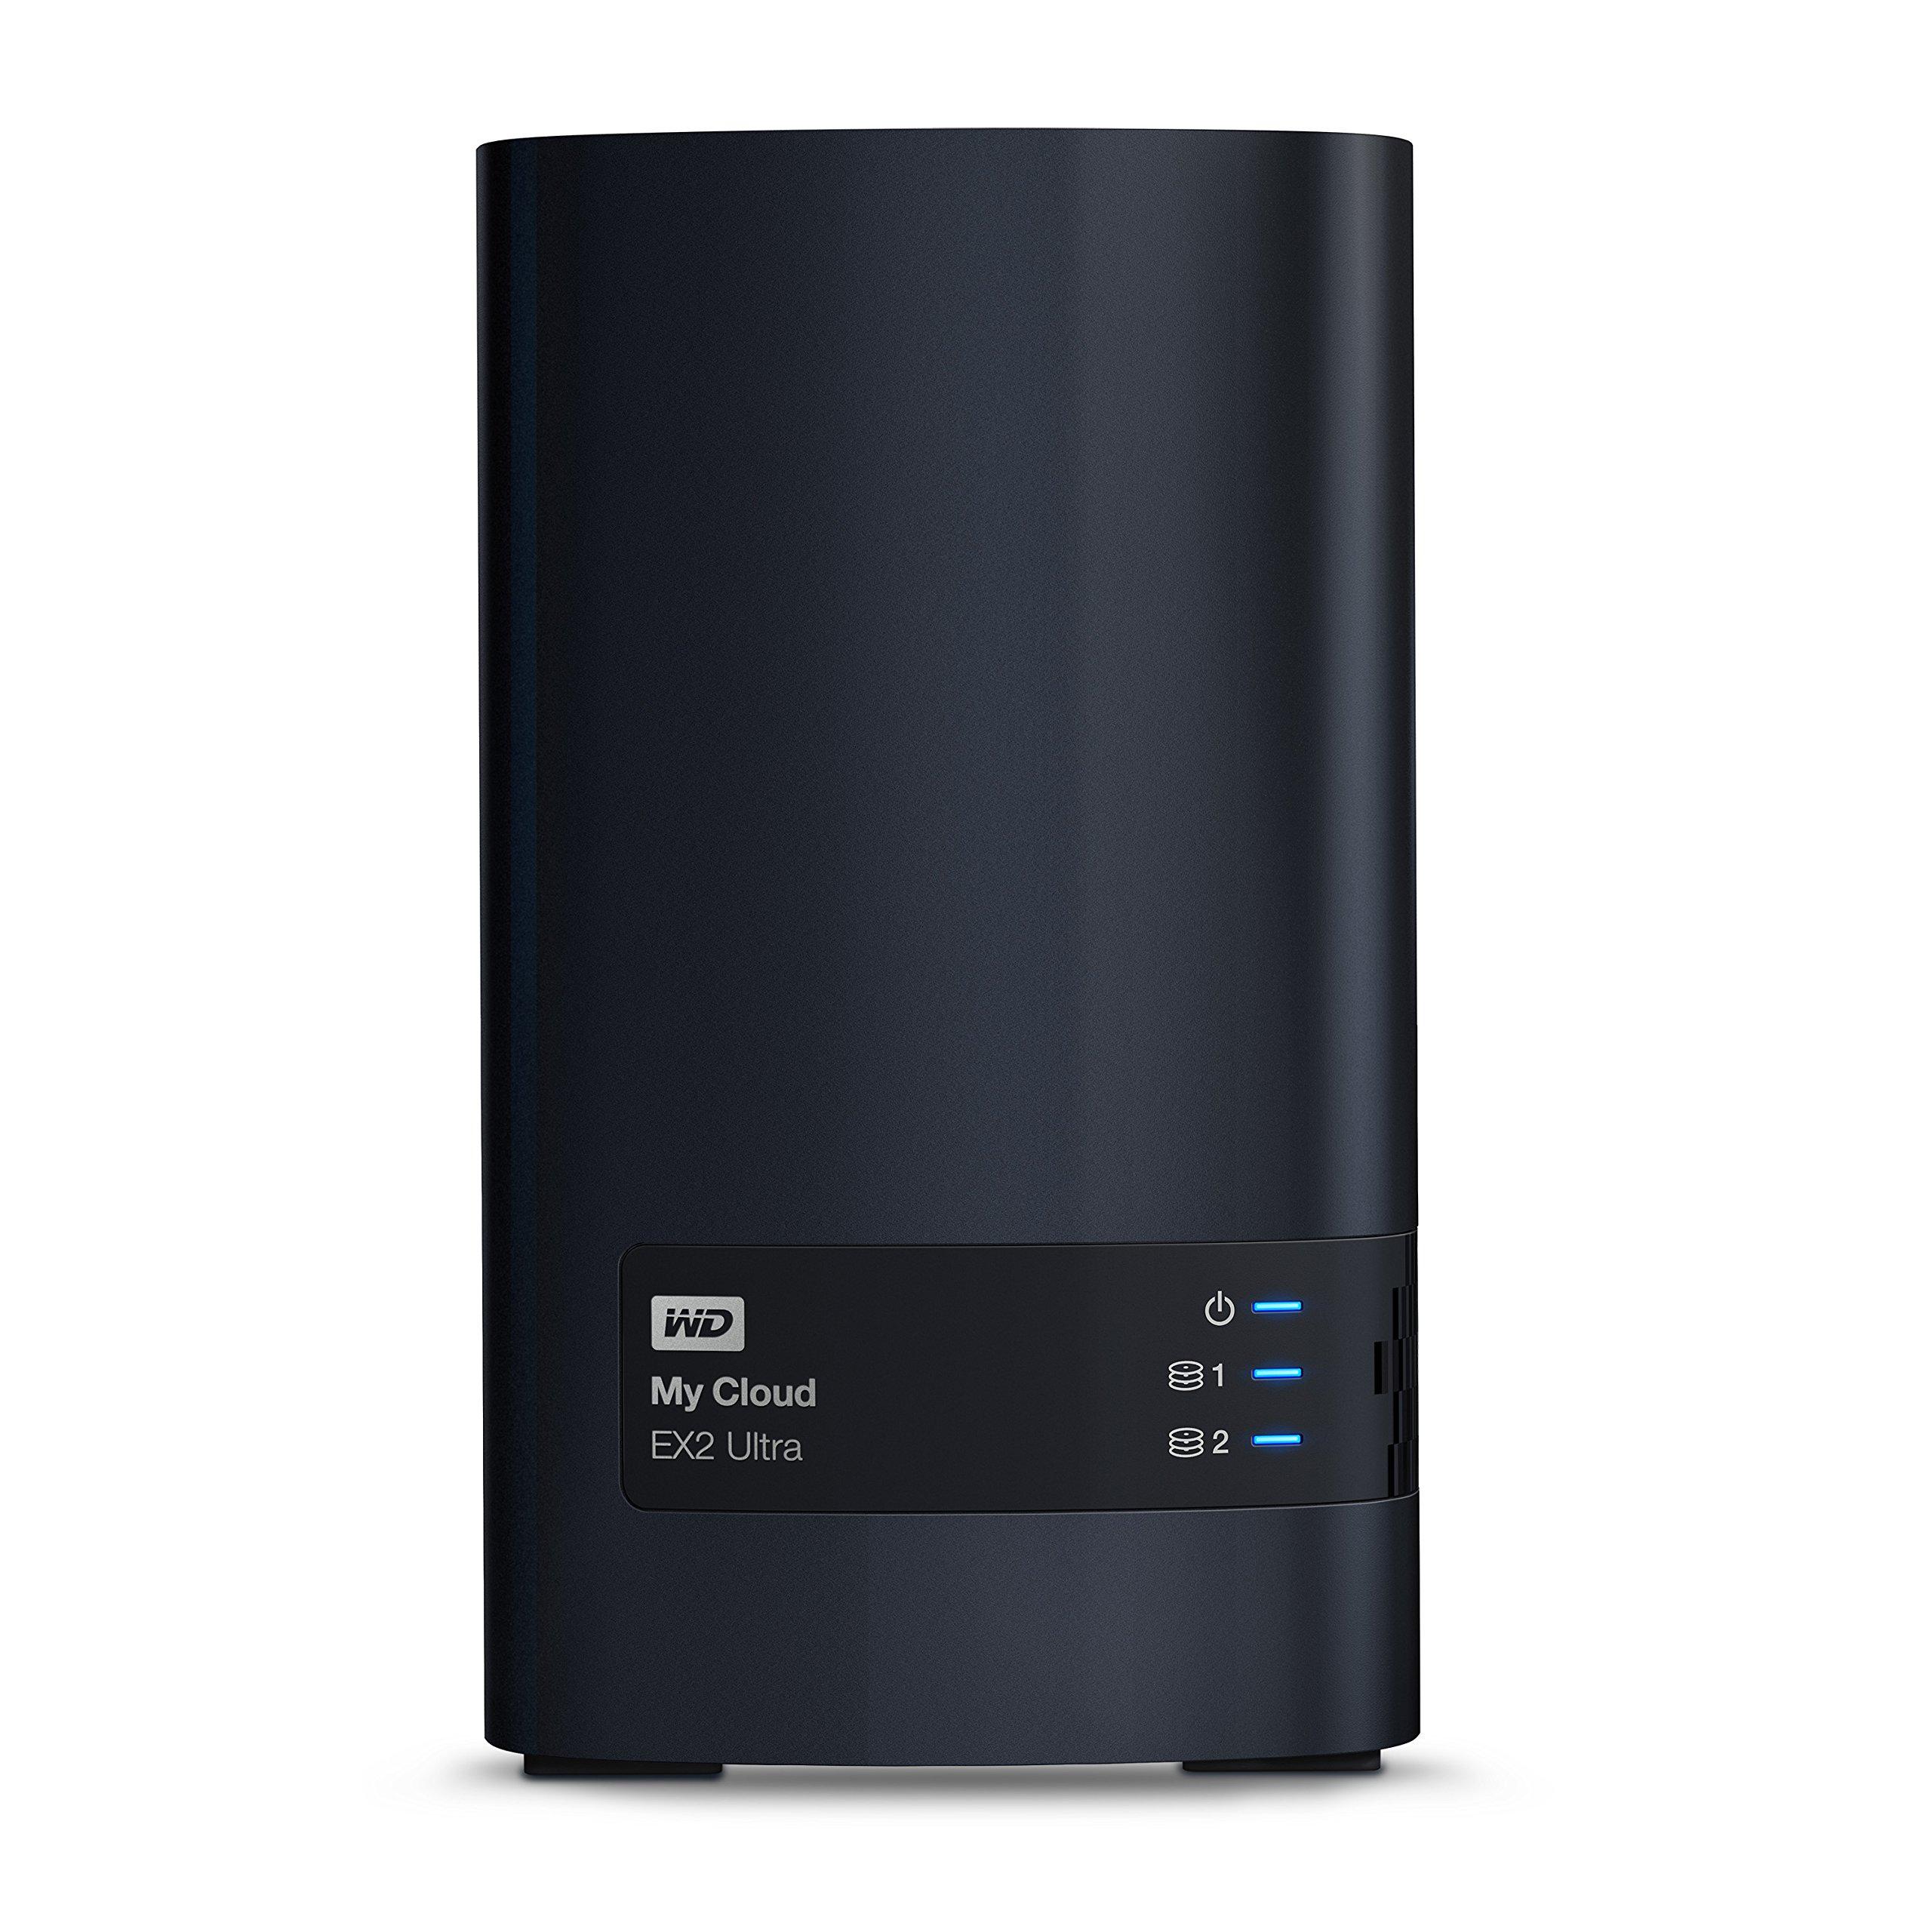 WD 4TB My Cloud EX2 Ultra Network Attached Storage - NAS - WDBVBZ0040JCH-NESN by Western Digital